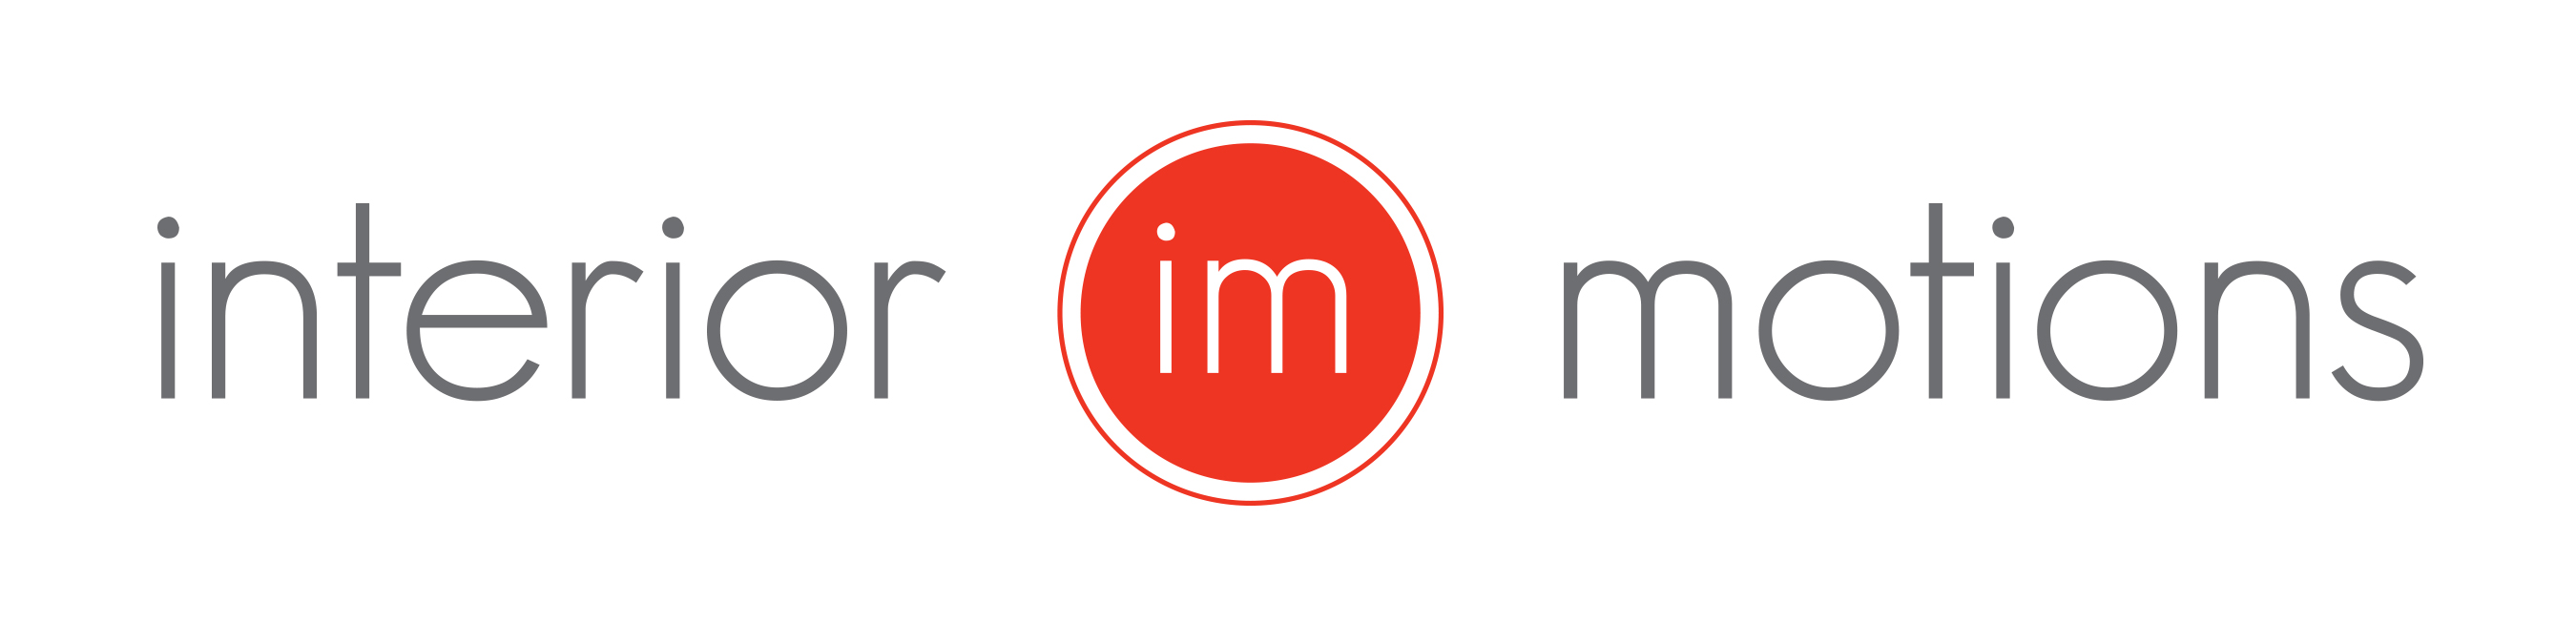 IM_logo_horizontal